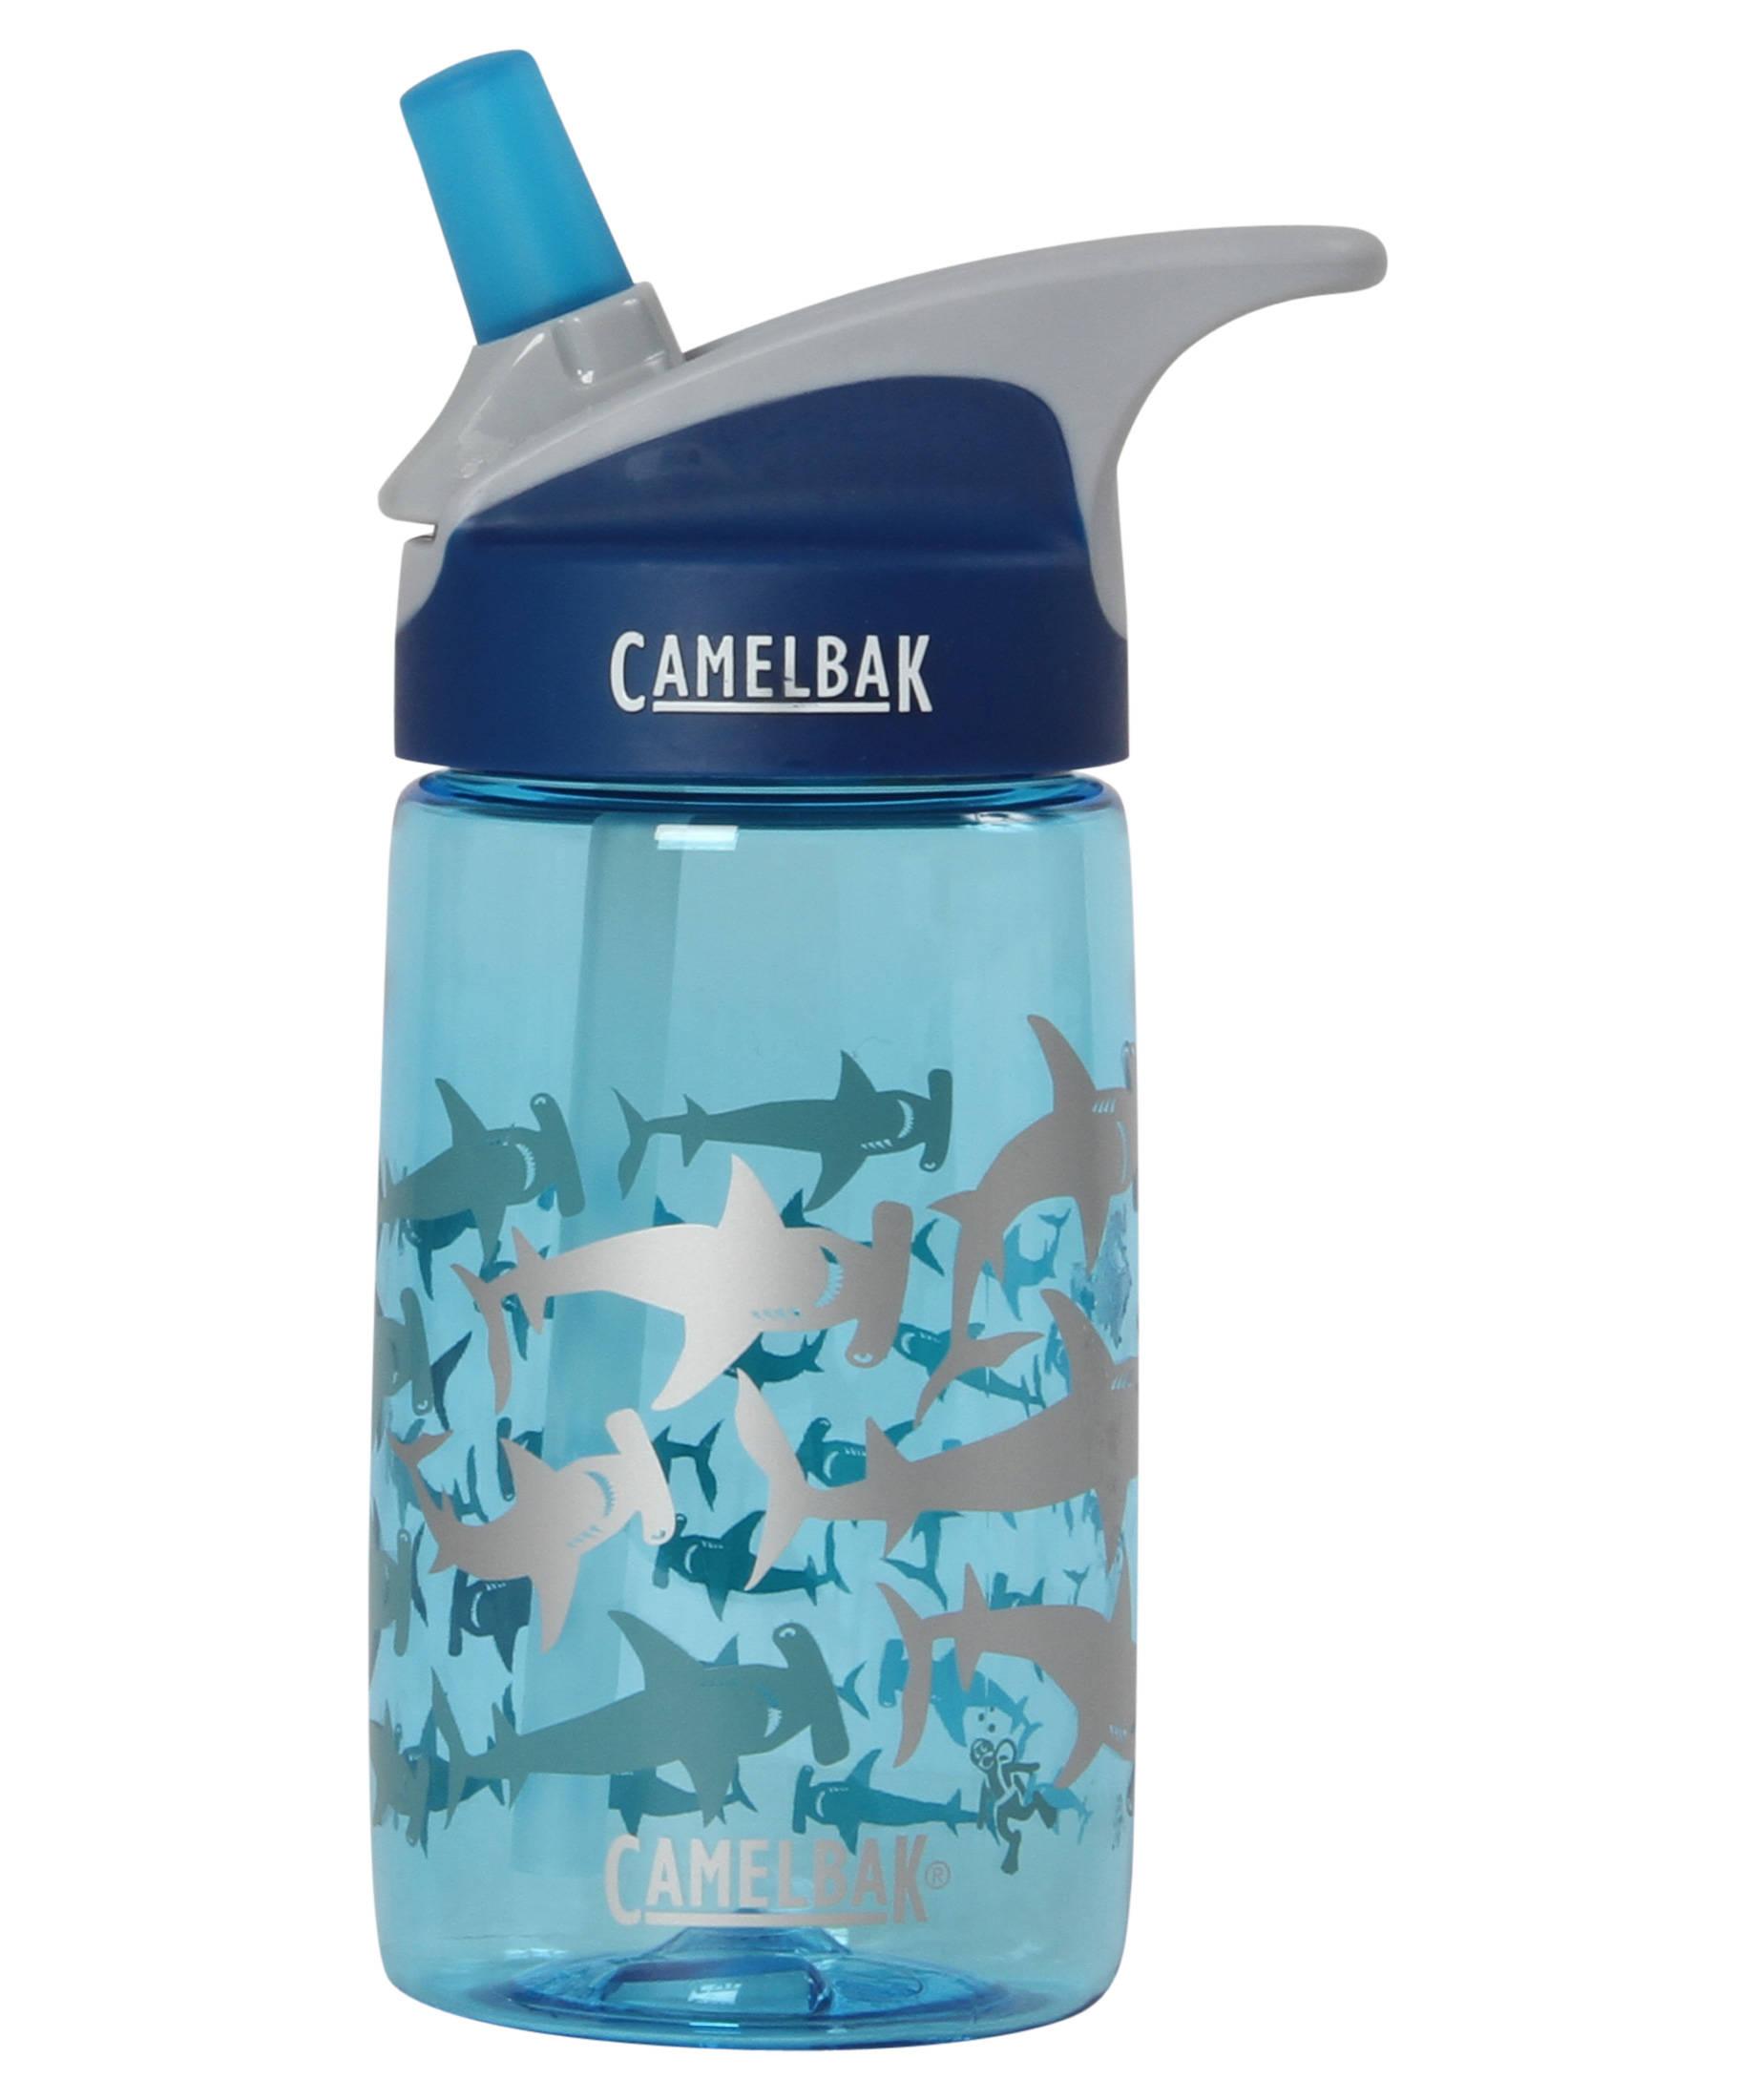 "Camelbak Kinder Trinkflasche ""Eddy Kid"""